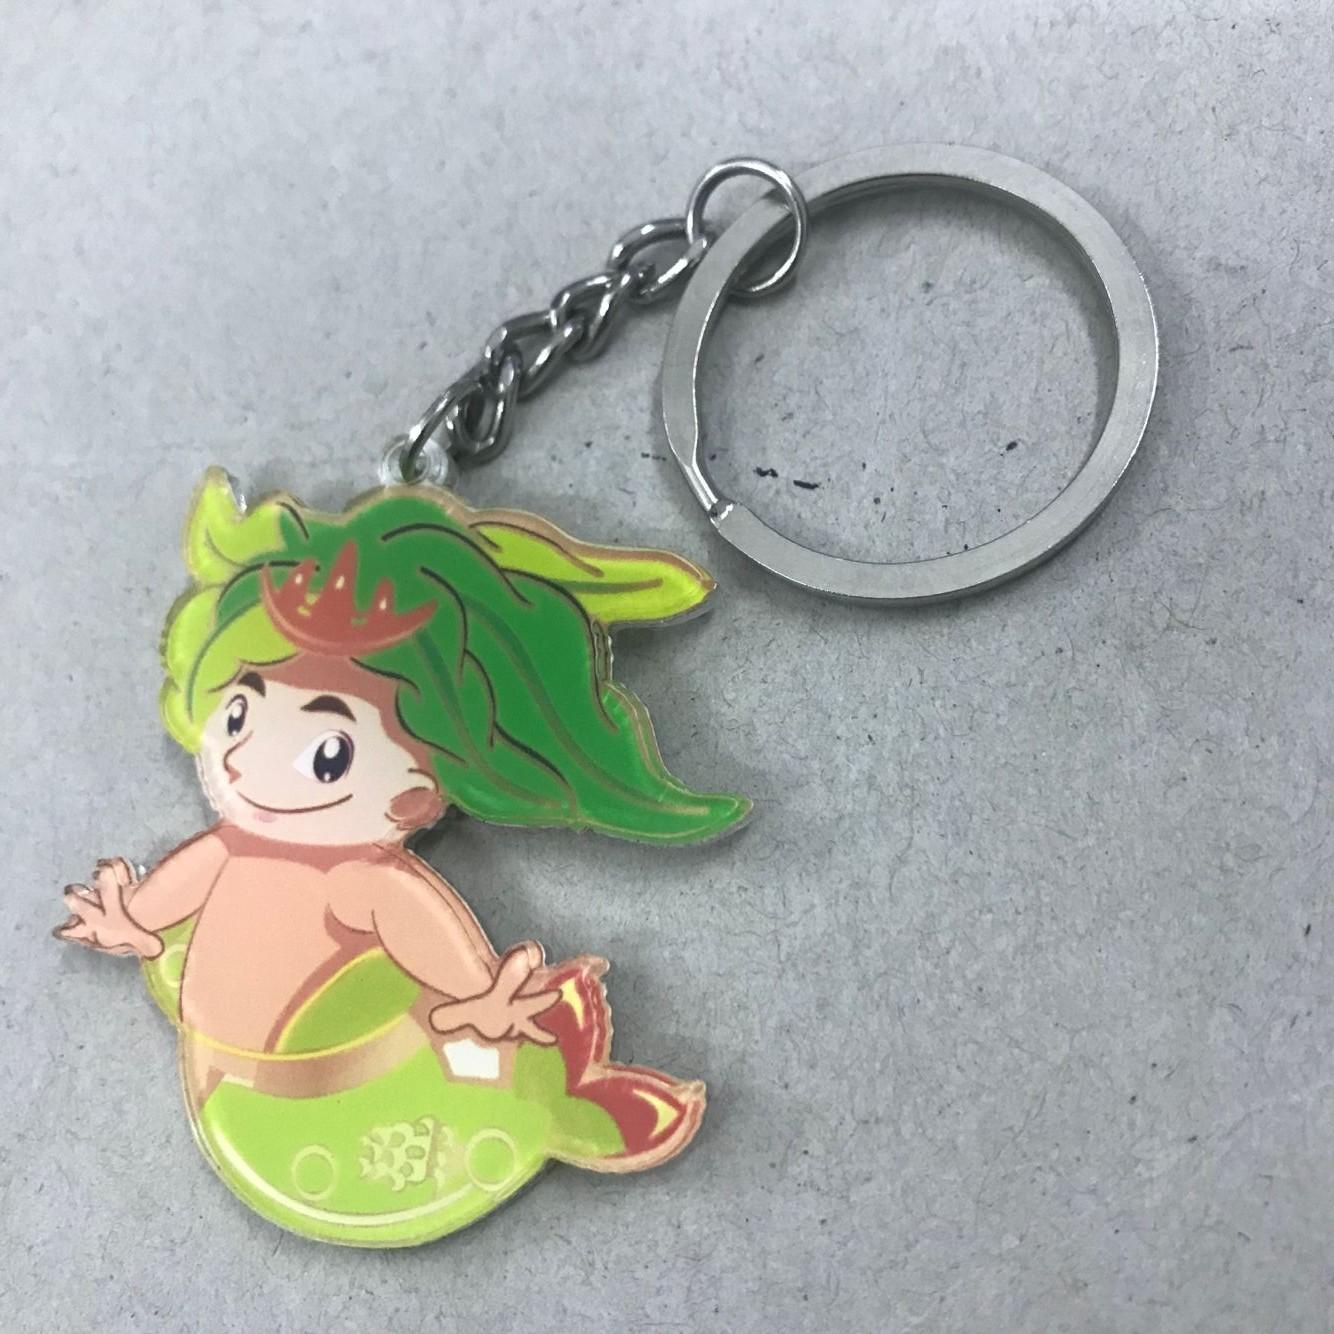 Custom Printed Acrylic Keychain,Fashionable Design Clear Anime Blank  Keychain Acrylic - Buy Custom Acrylic Keychain,Acrylic Keychains,Acrylic  Keychain